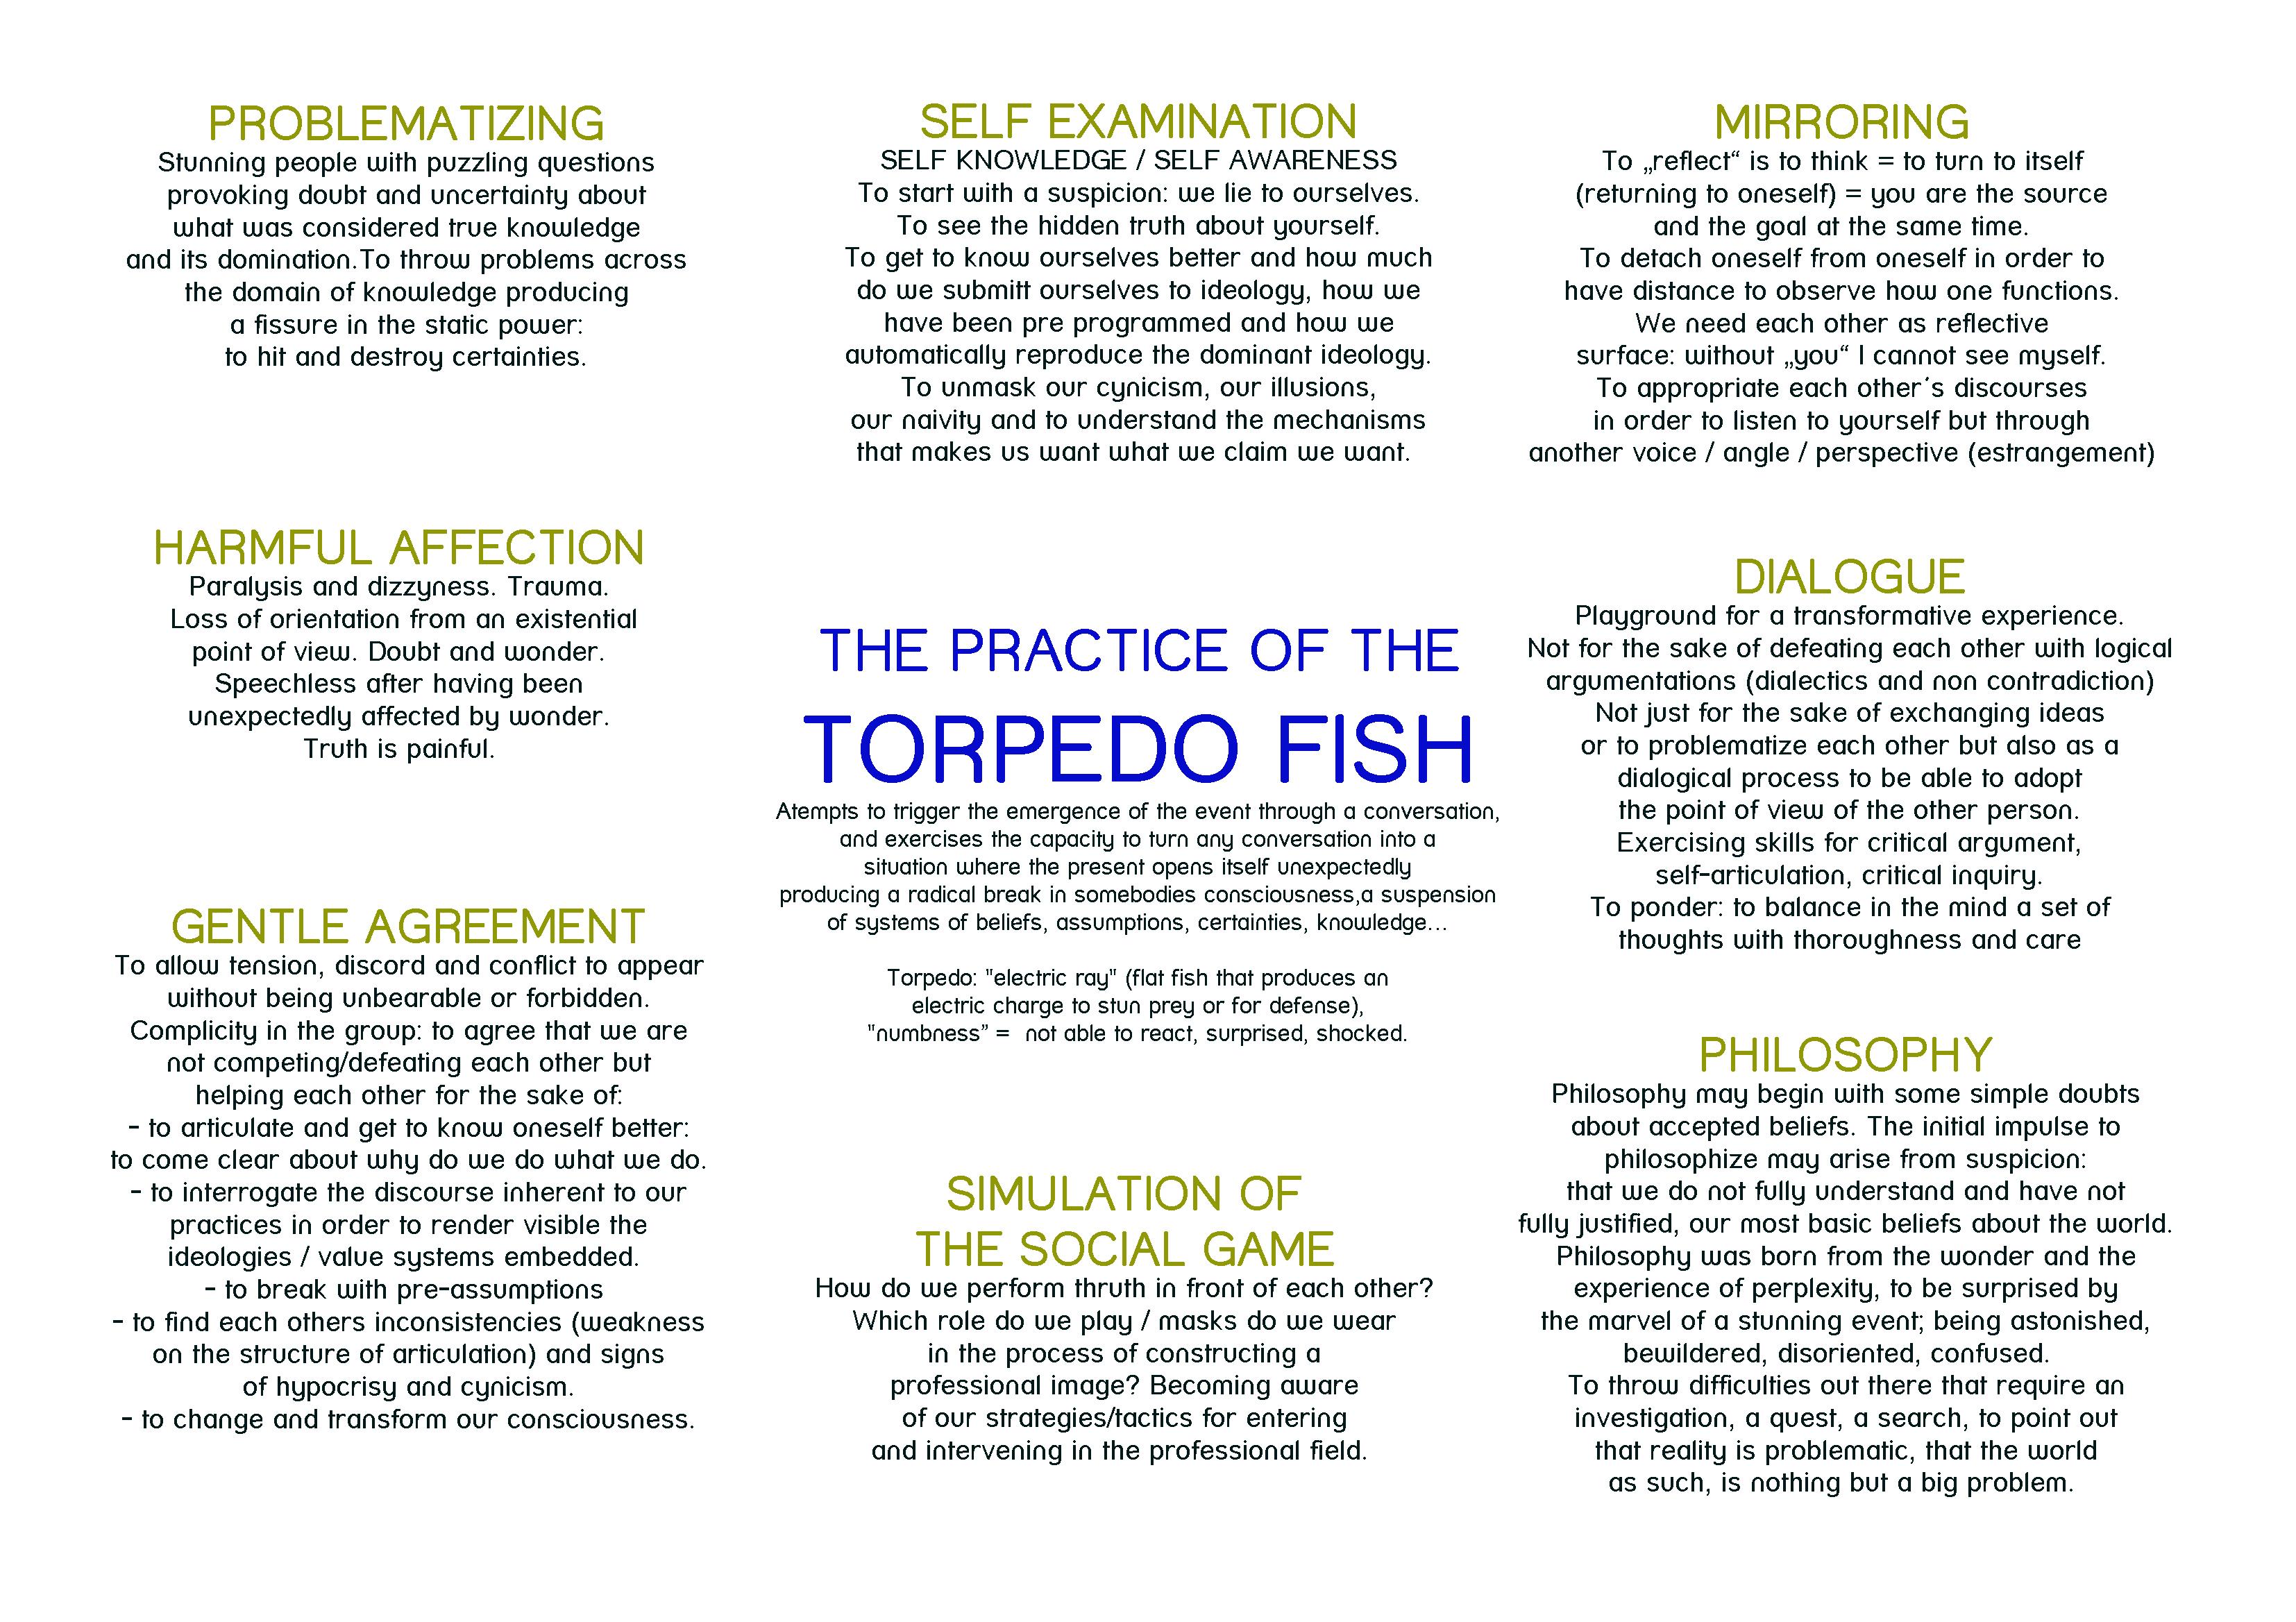 TORPEDO FISH by Diego Agulló